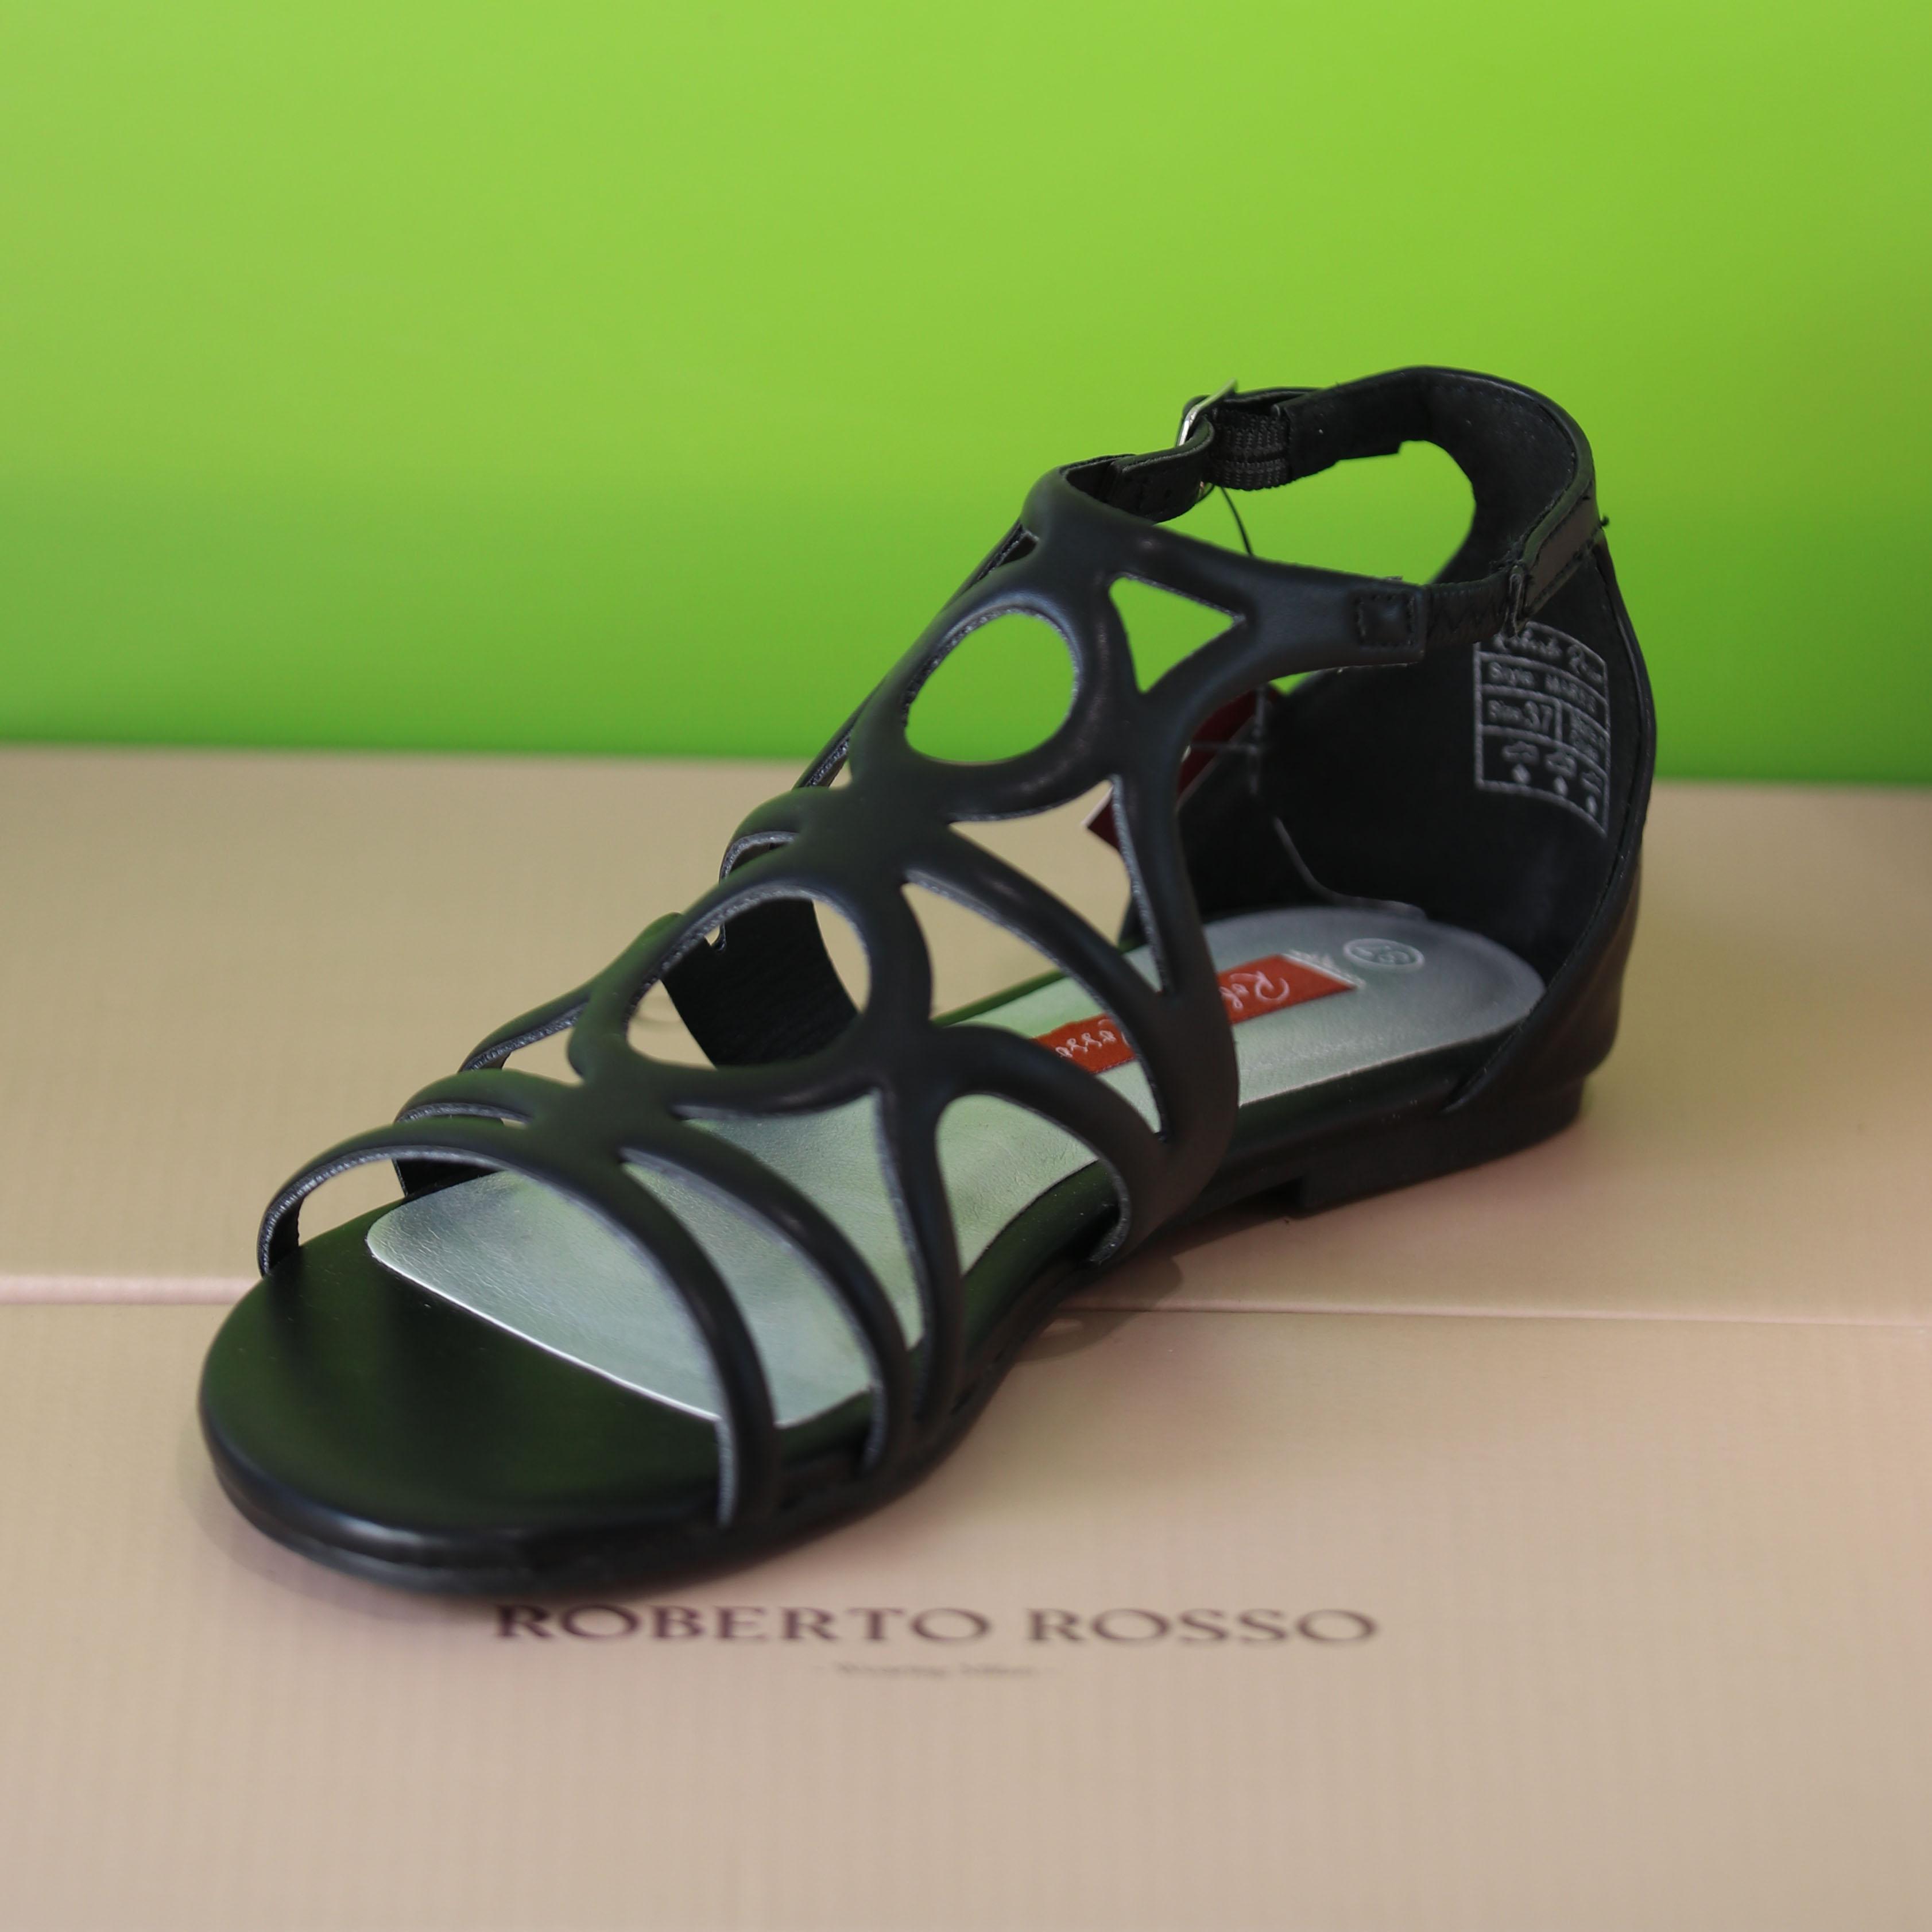 roberto rosso – martis sort sandal dame1